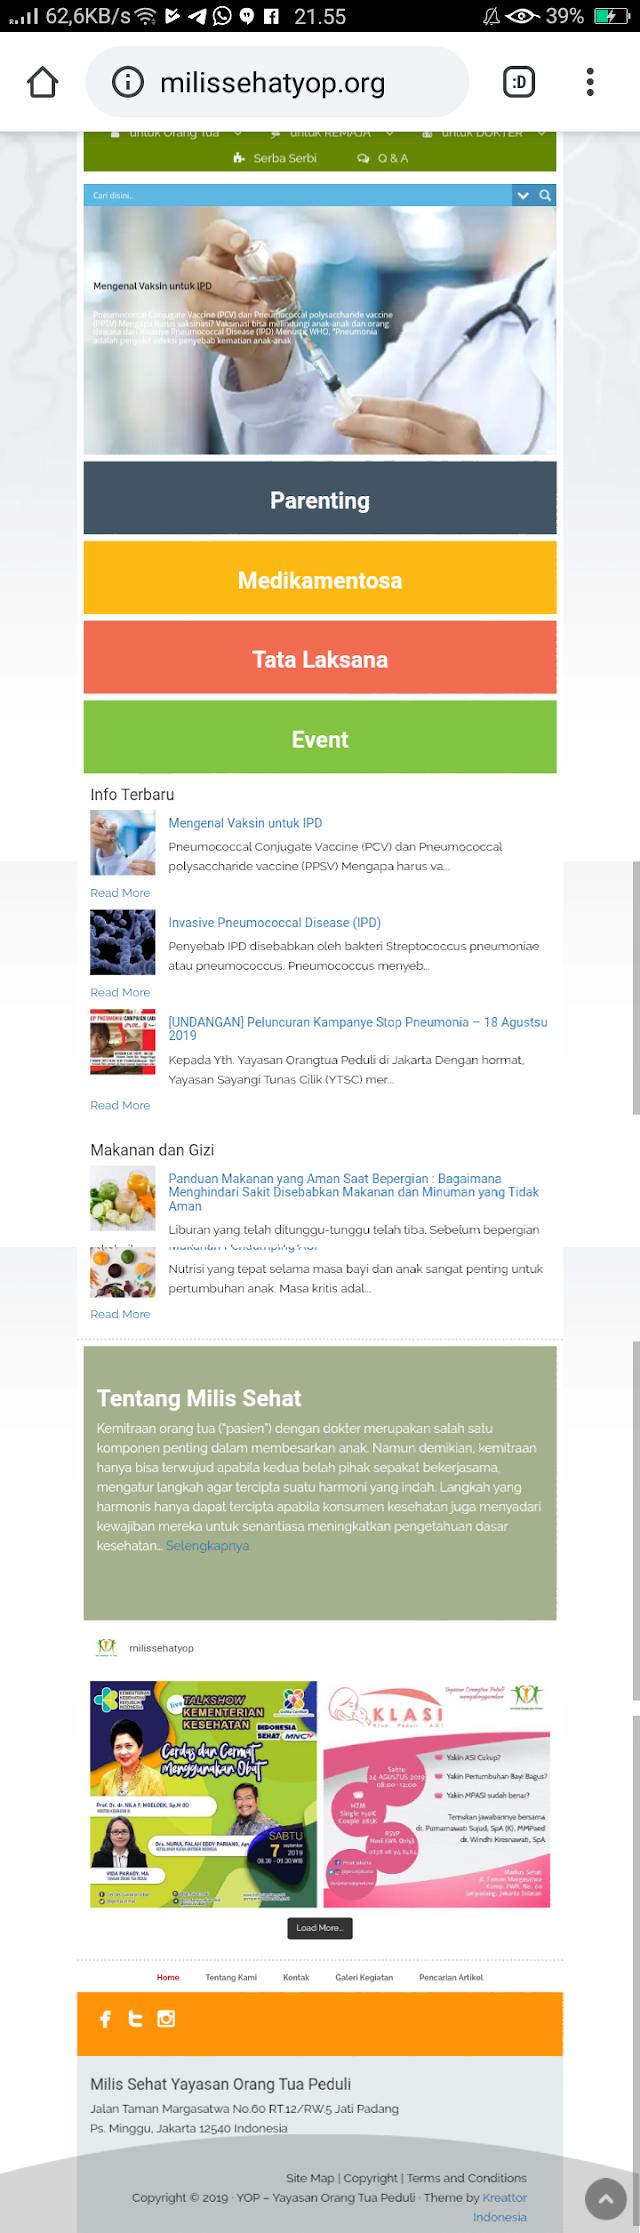 Review Website Milis Sehat